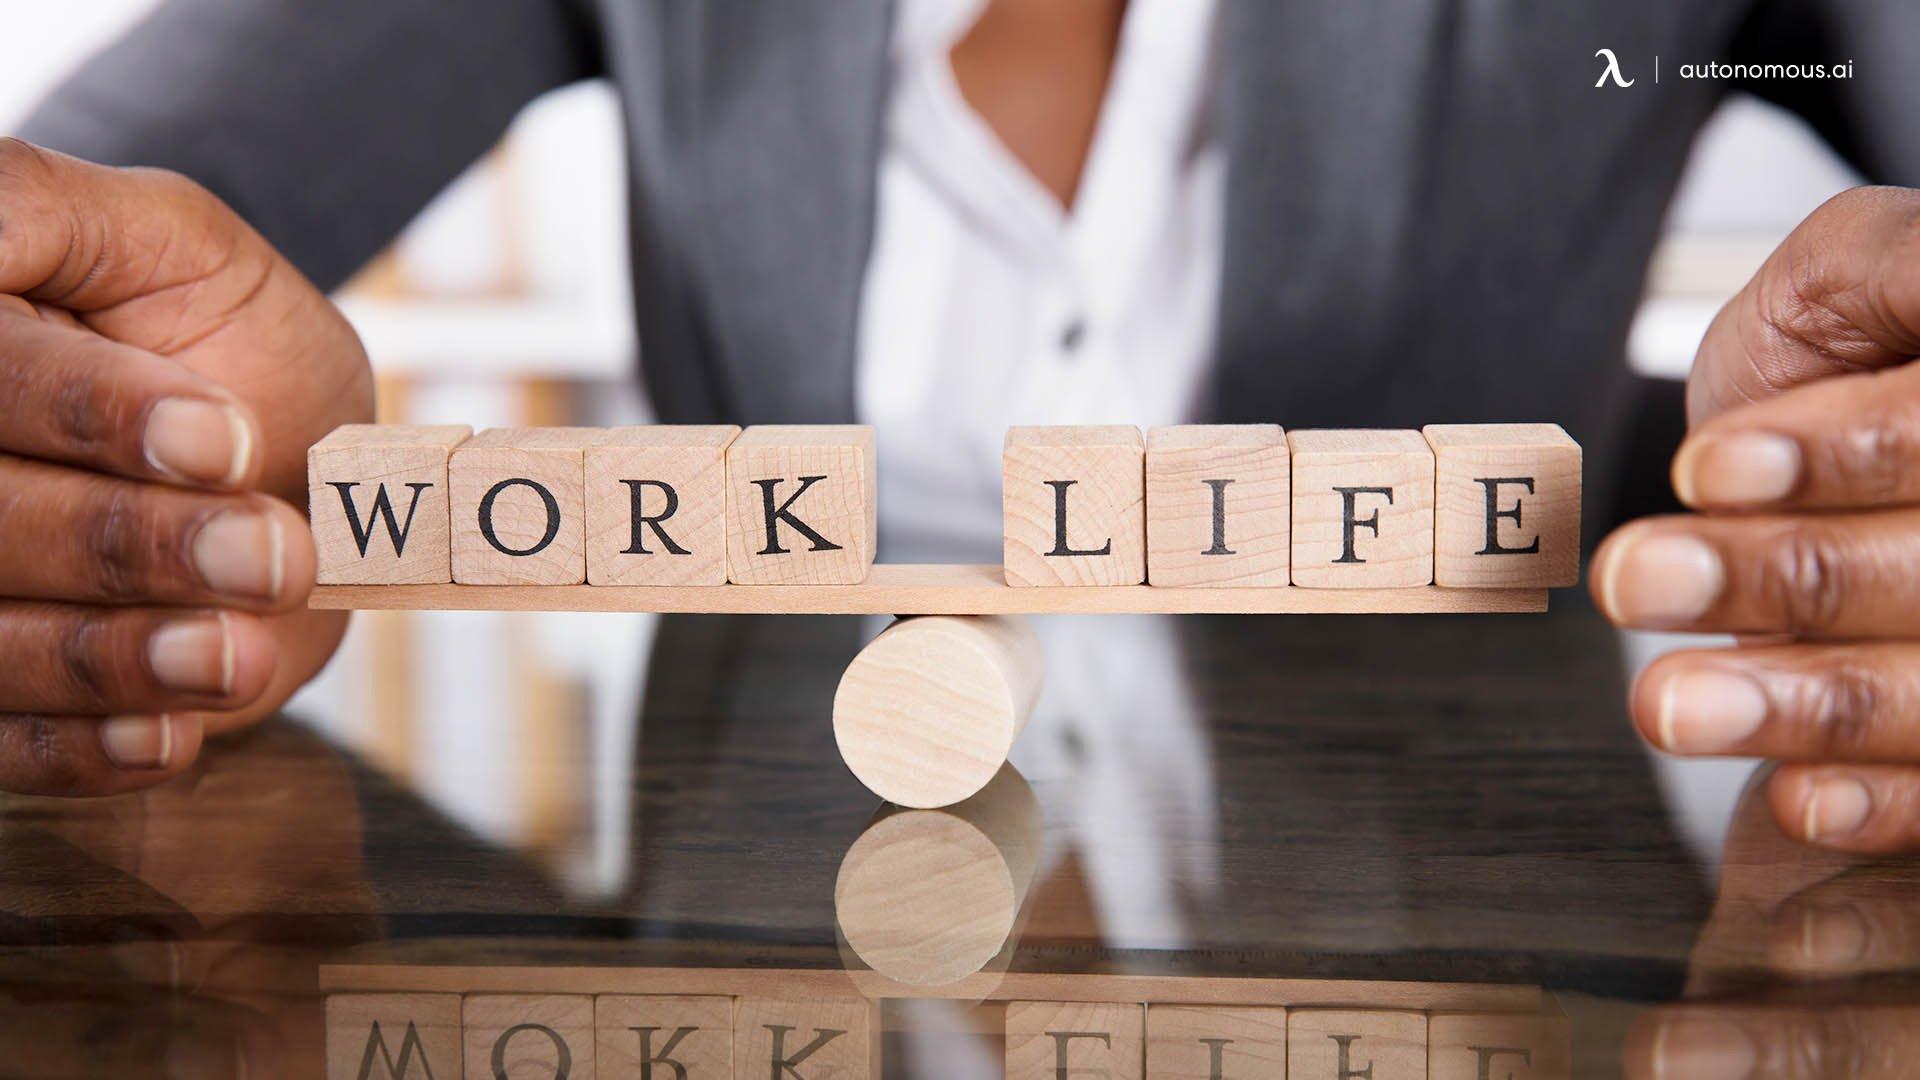 Improved Work-Life Balance